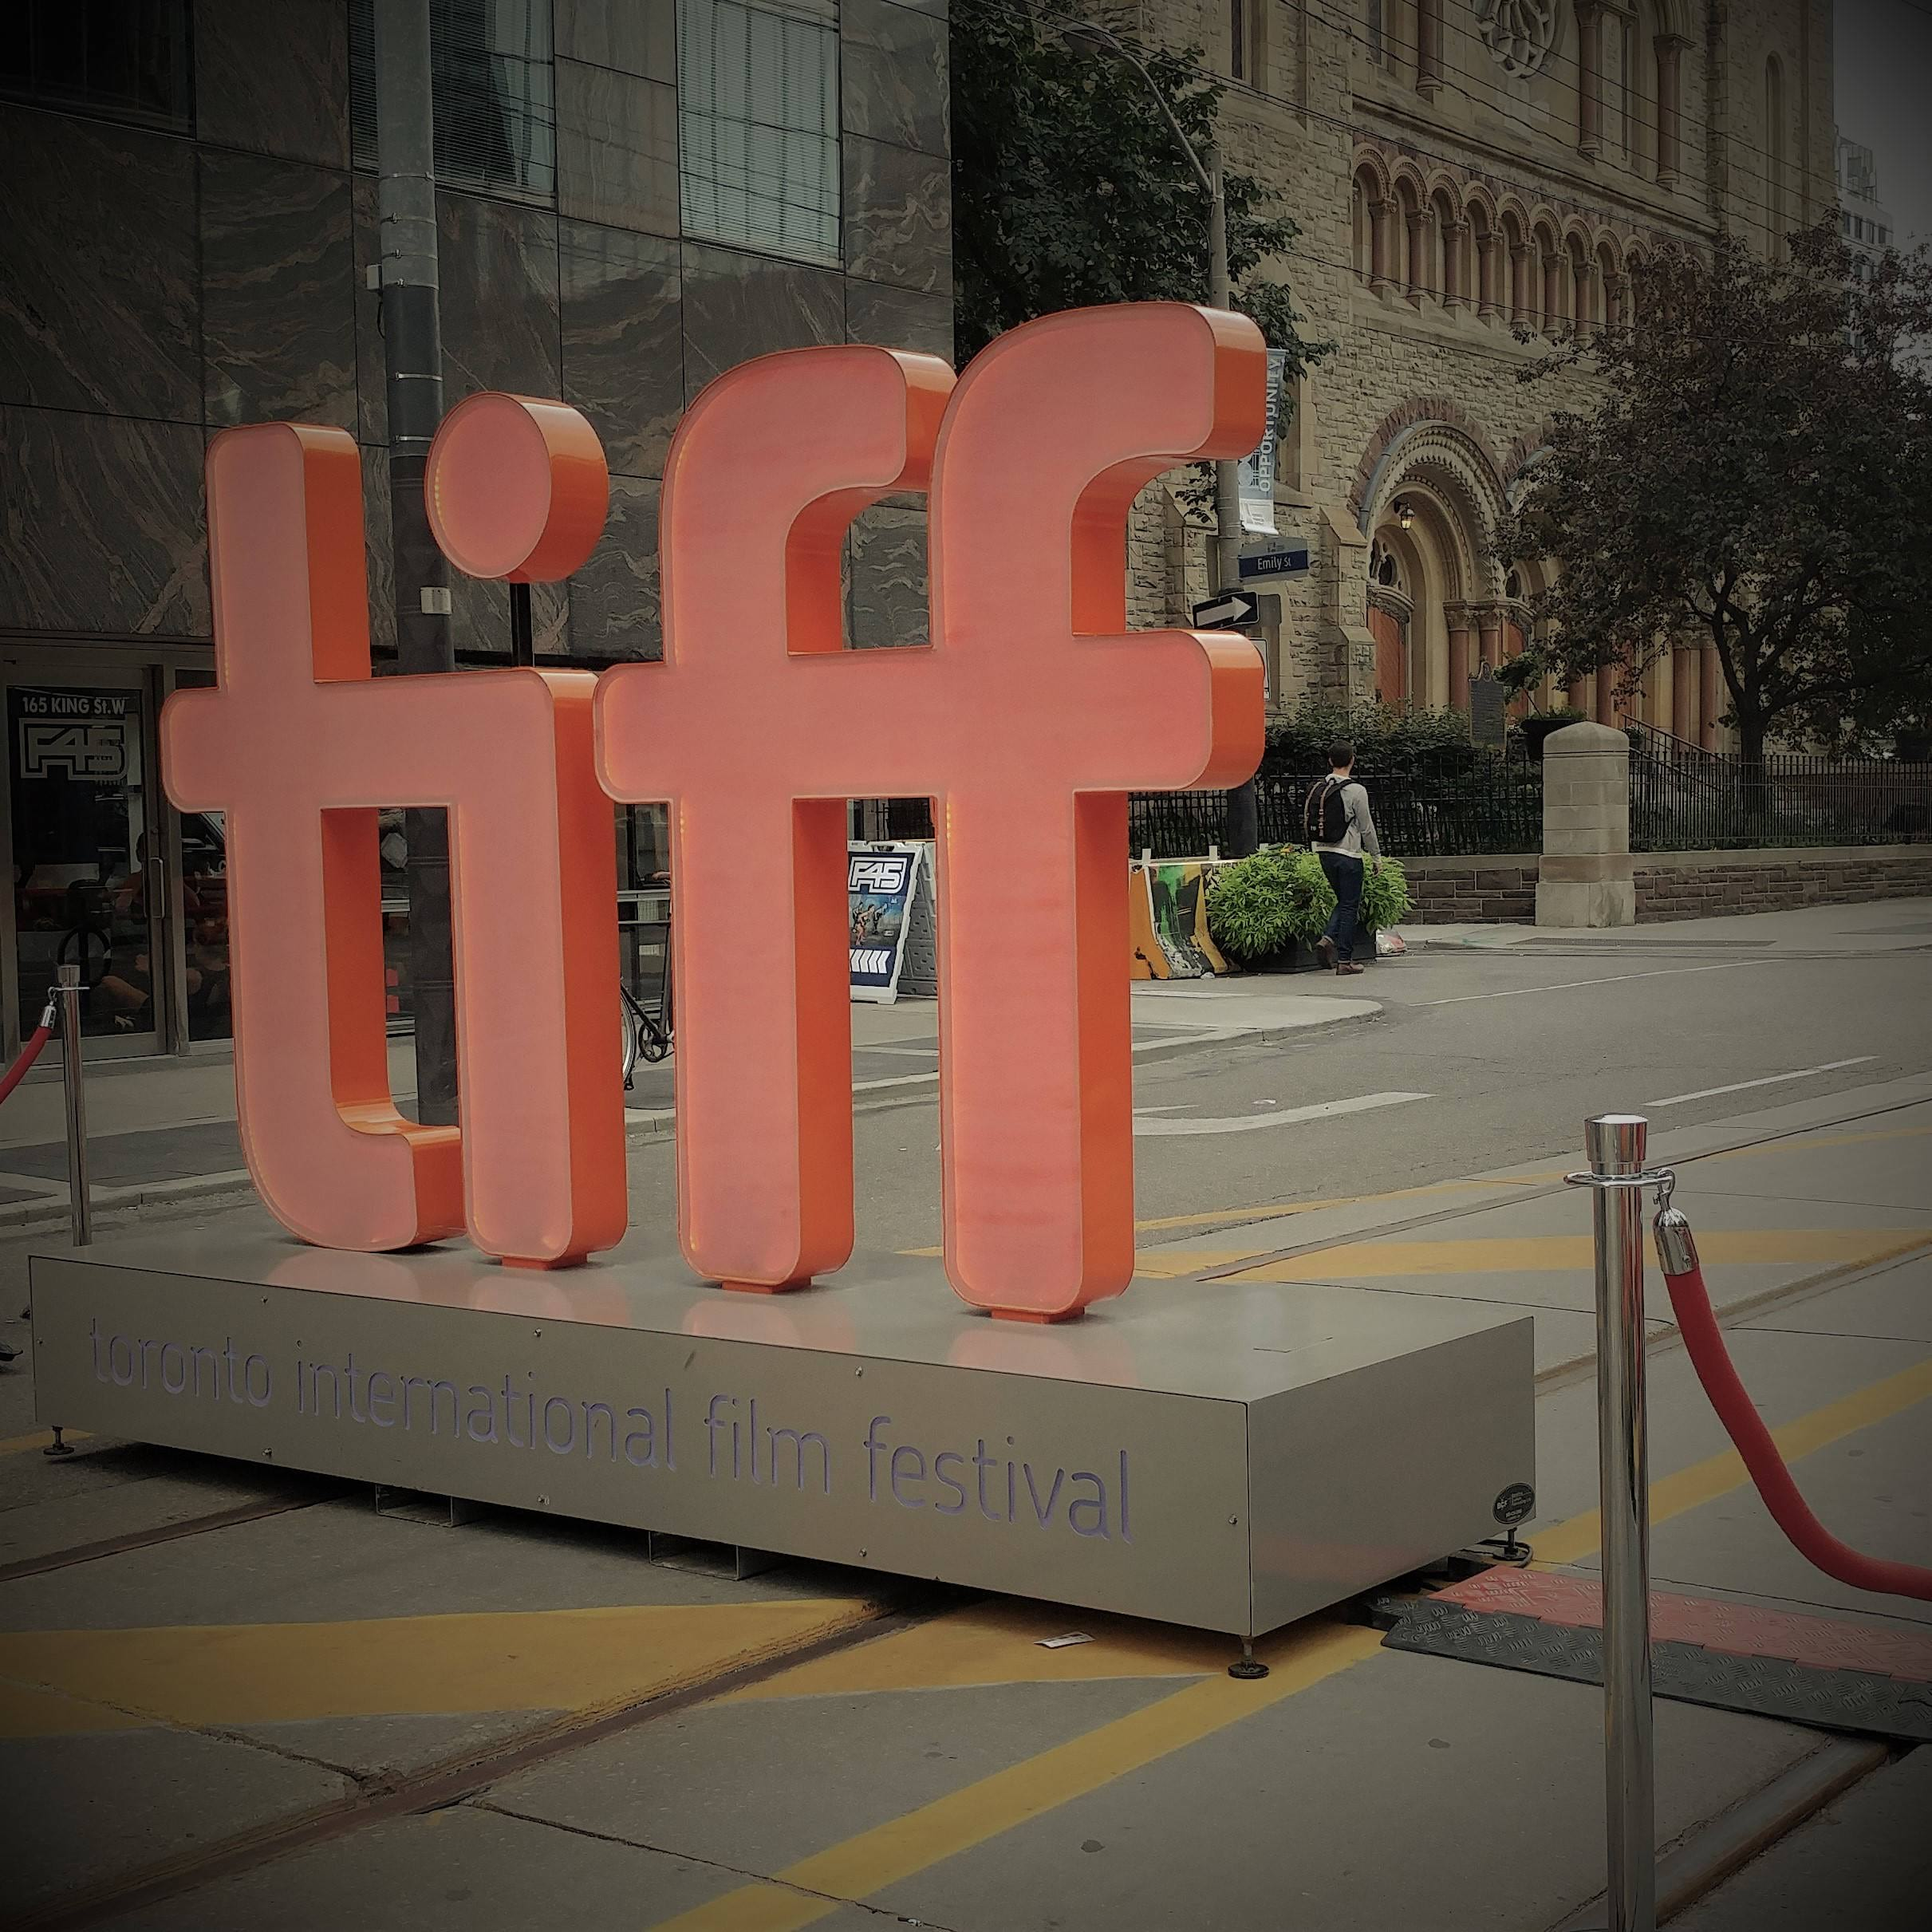 #28 TIFF 2018 Teaser